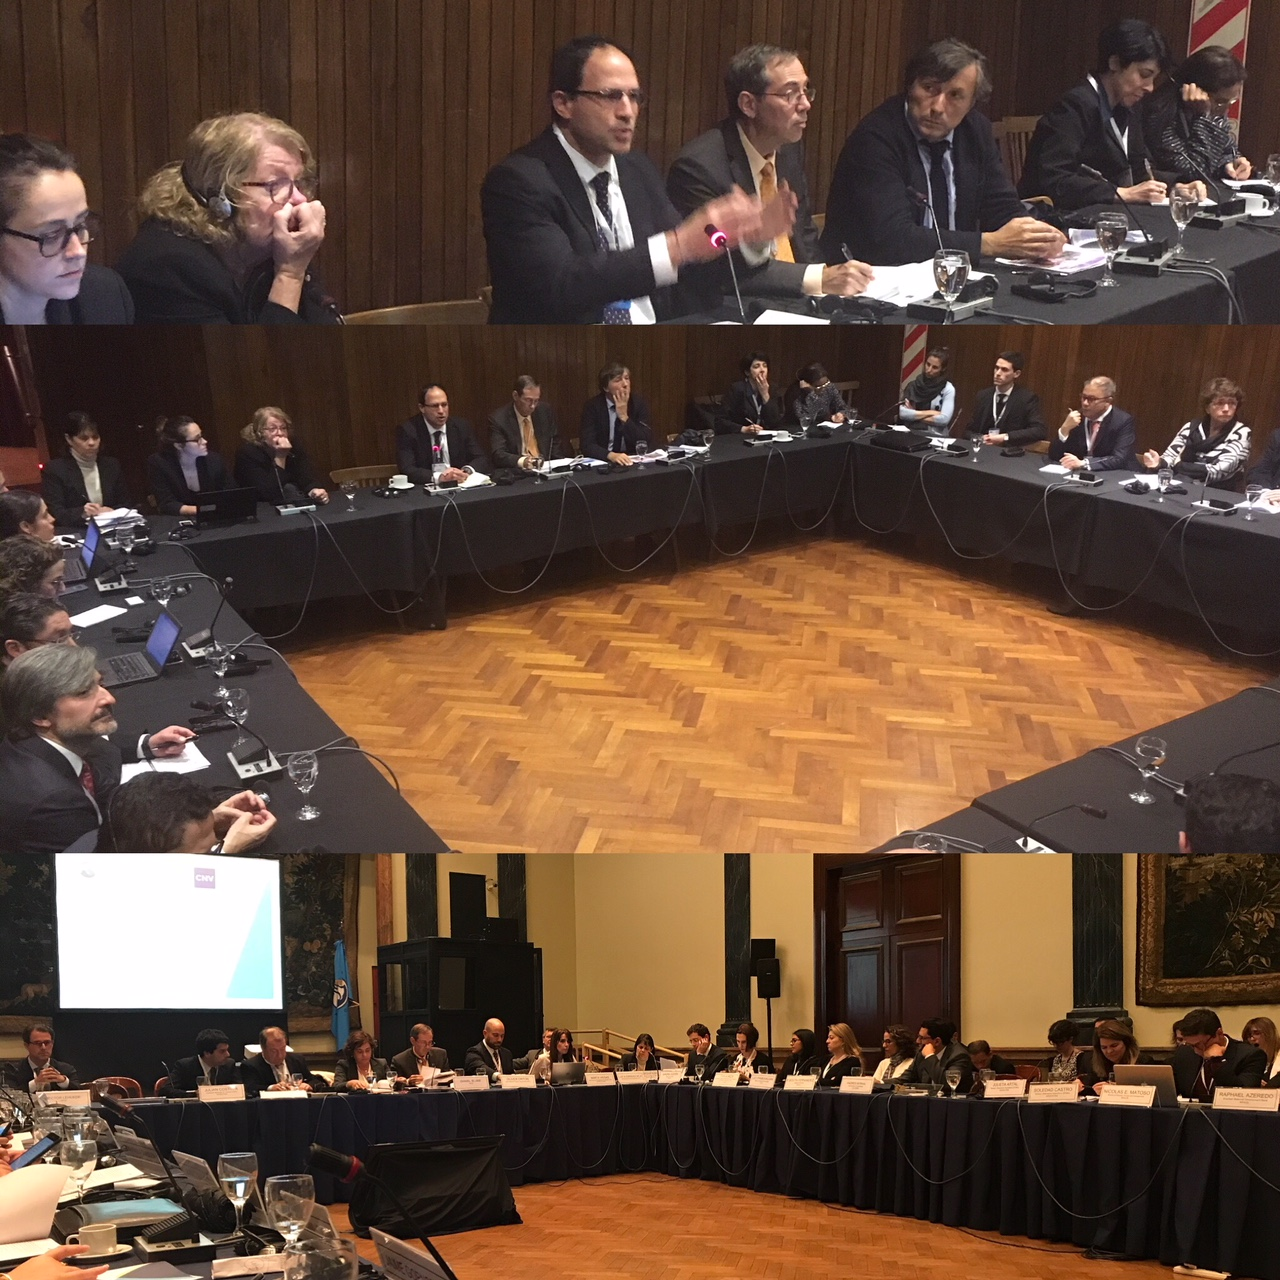 OECD BA pics.jpg